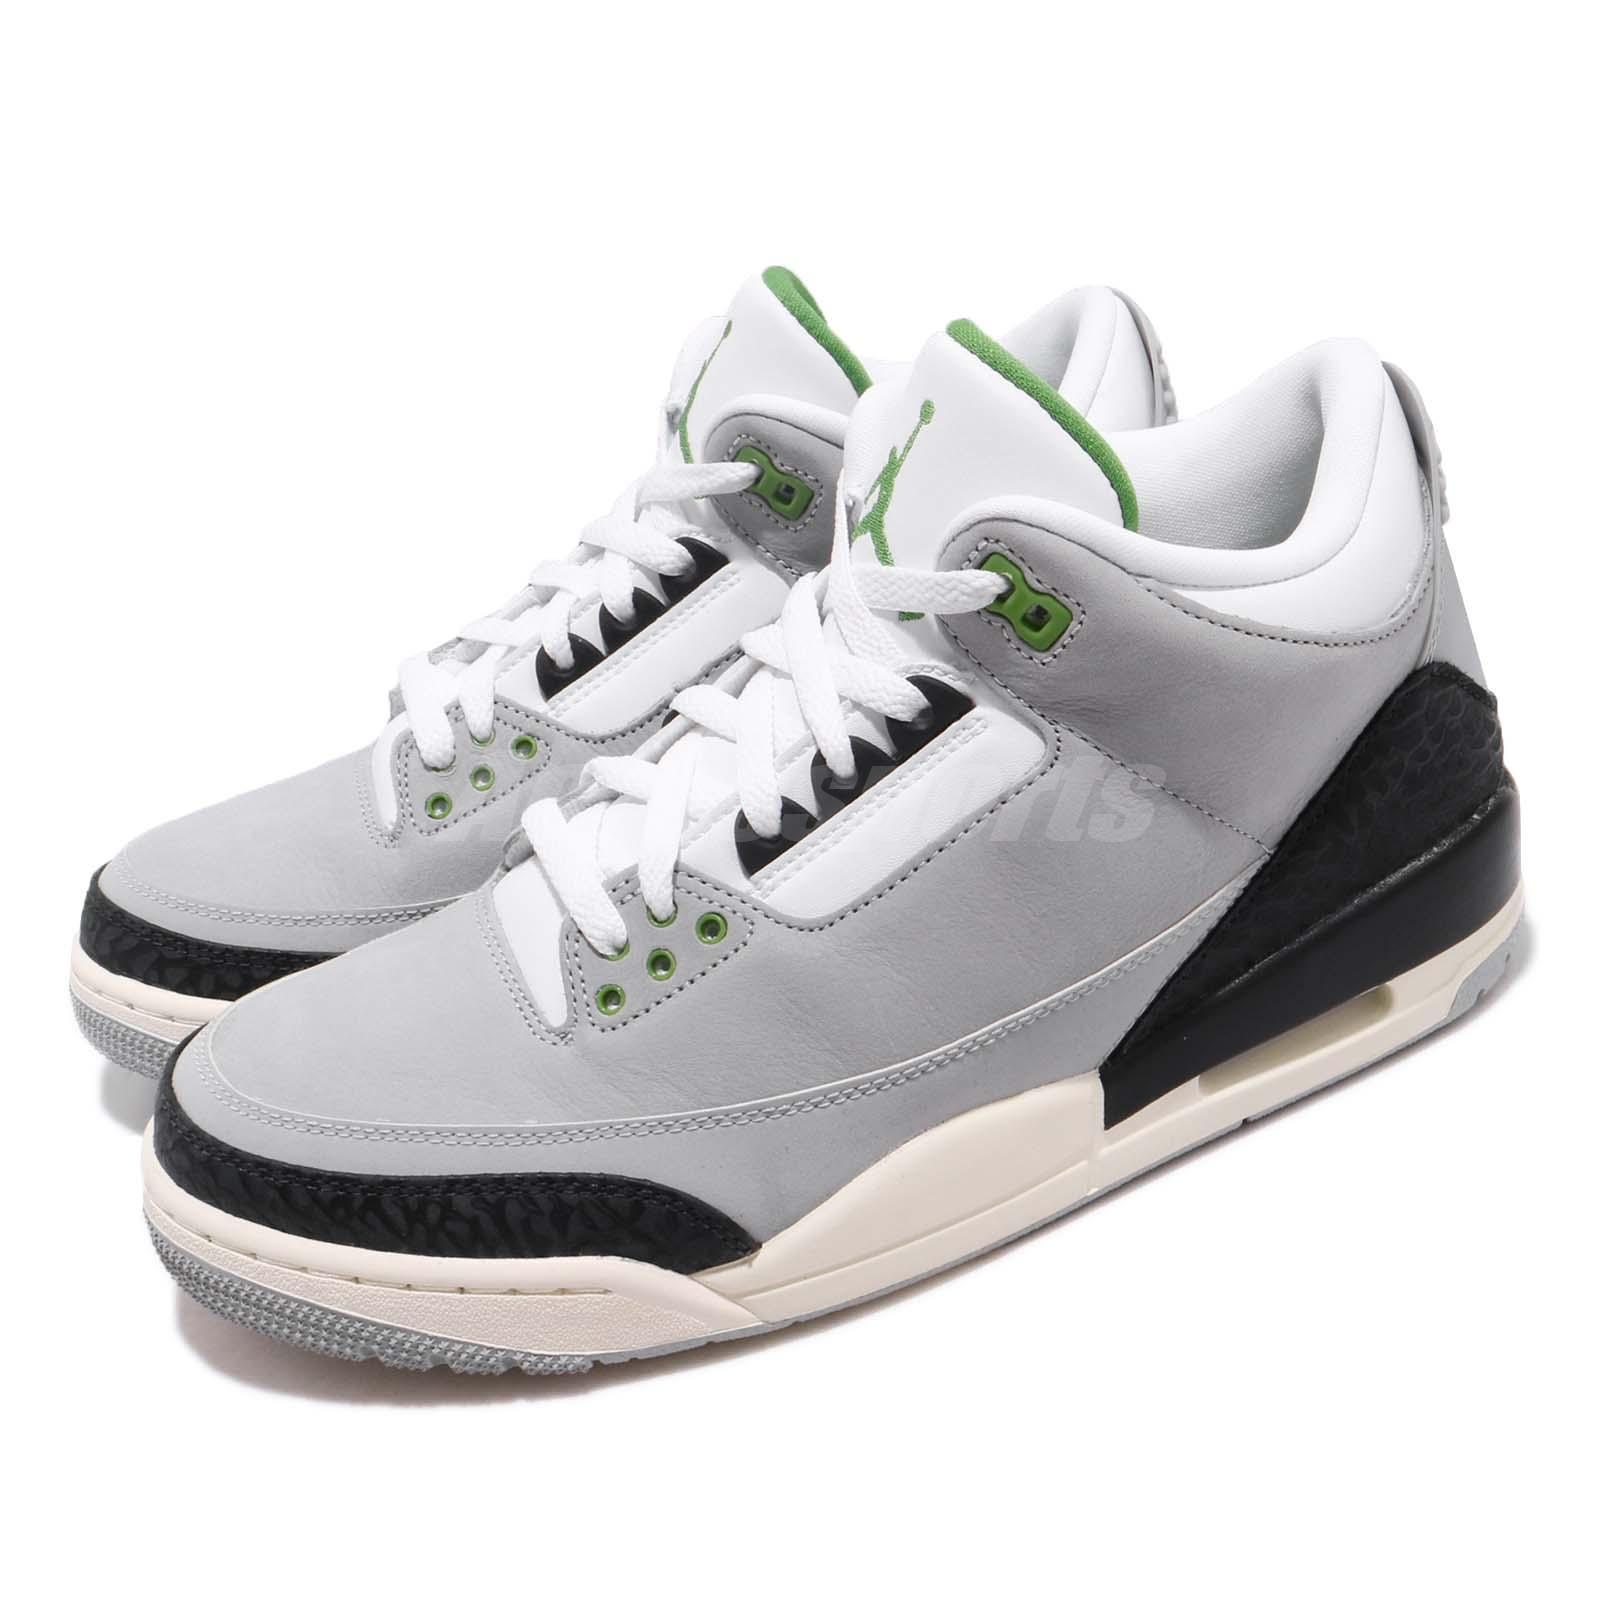 66a25382520 Details about Nike Air Jordan 3 Retro Chlorophyll Tinker Smoke Grey Black  Green 136064-006